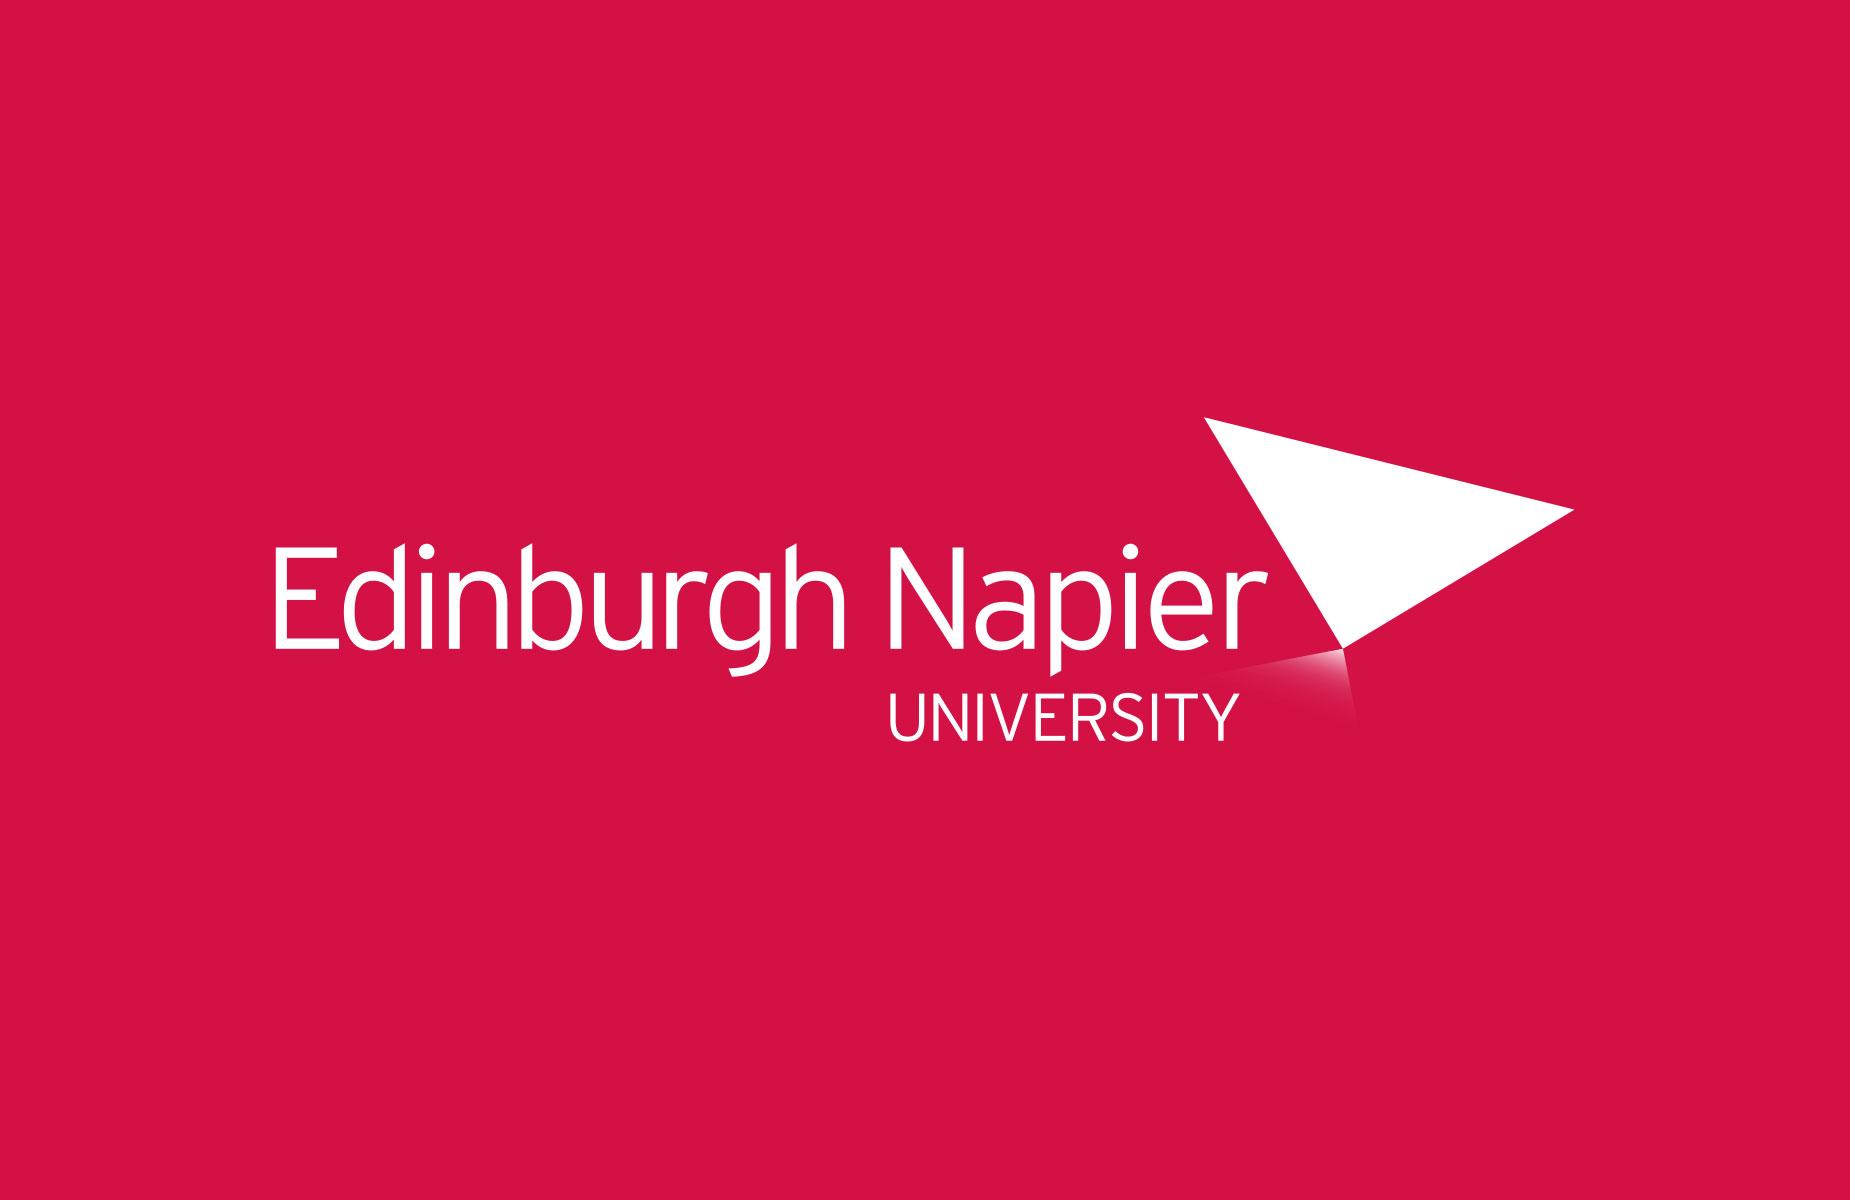 Edinburgh Napier University - View case study